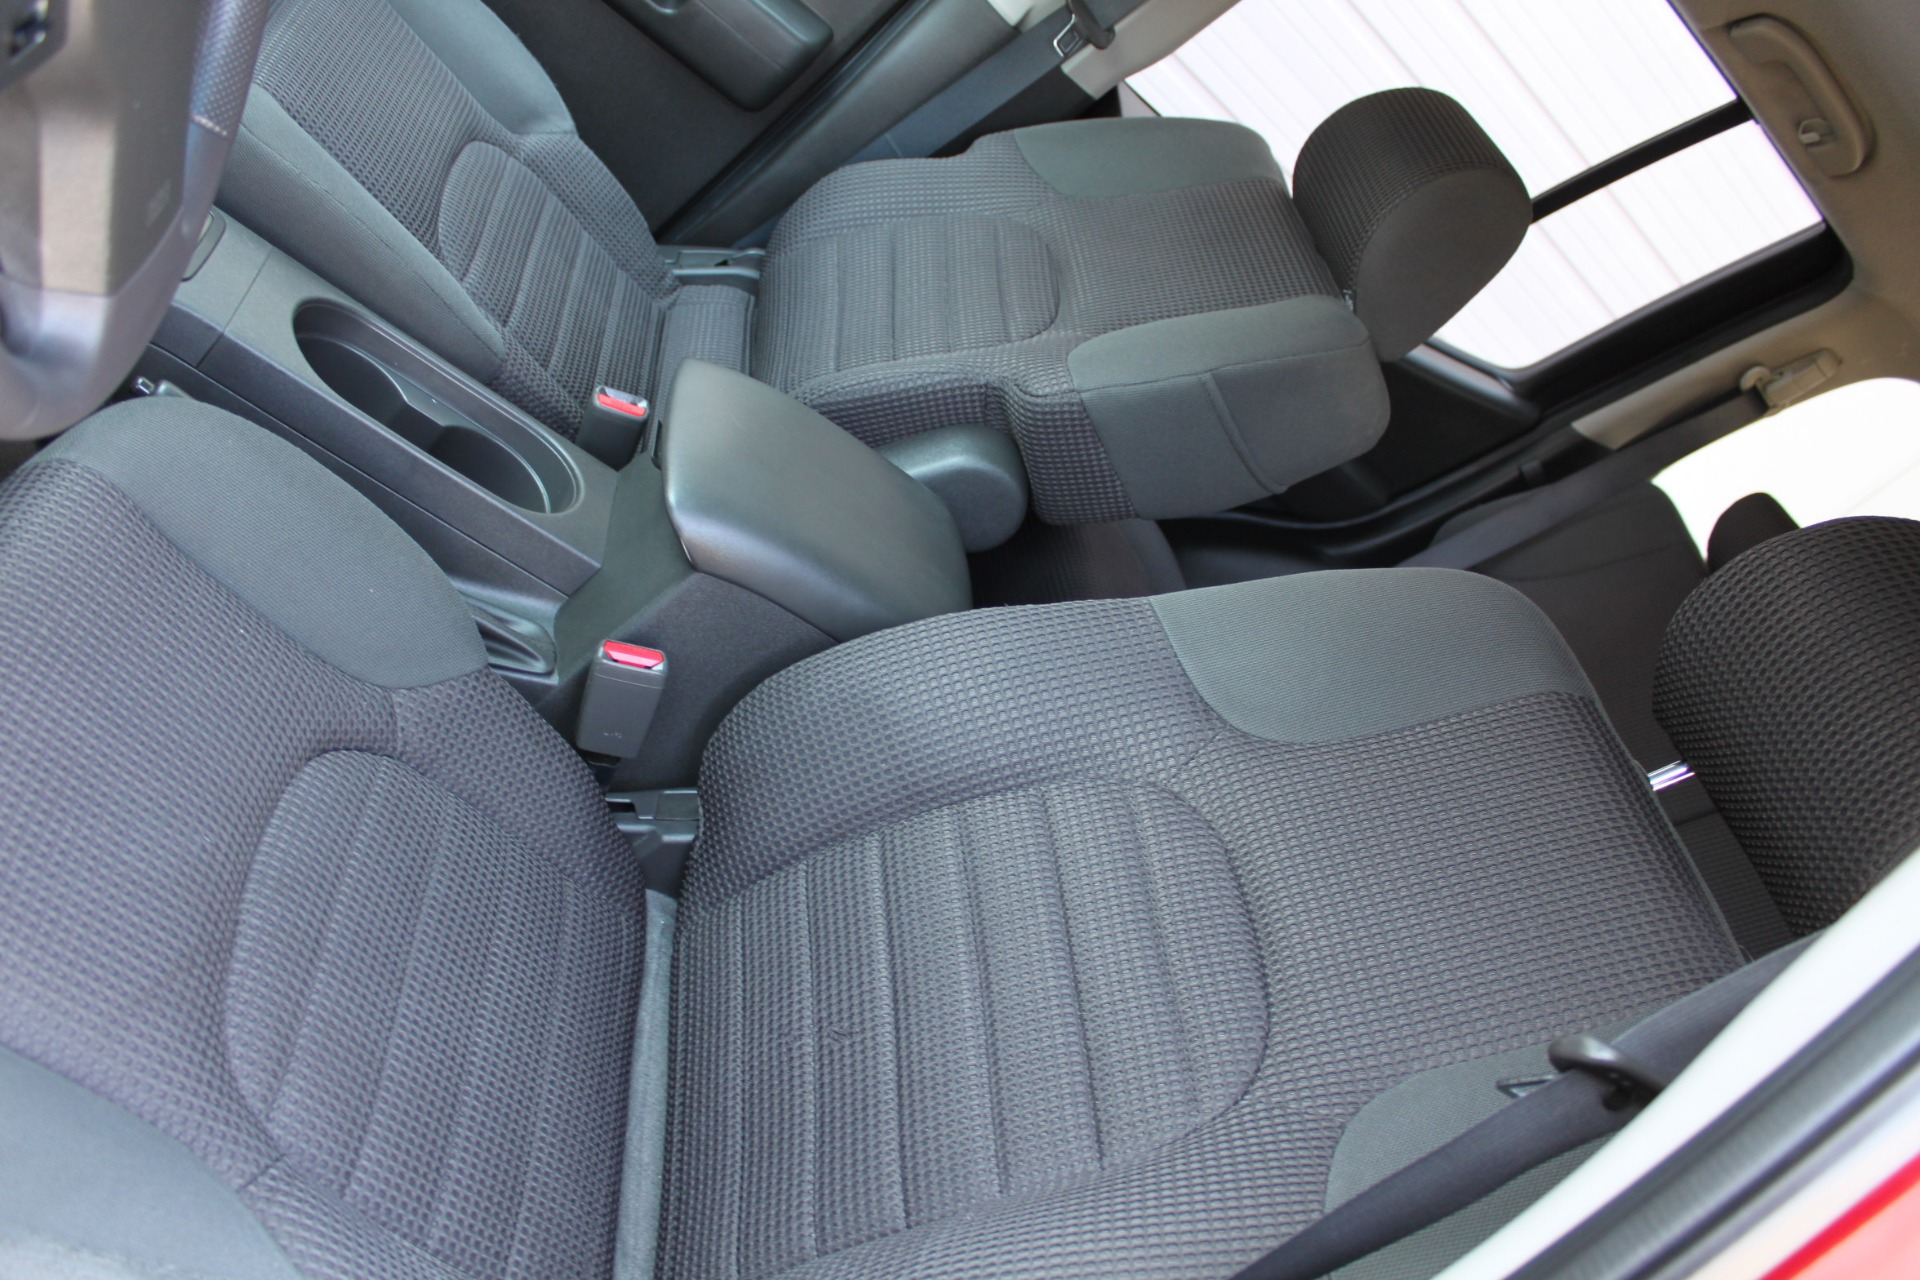 Used-2006-Nissan-Xterra-Off-Road-Ferrari